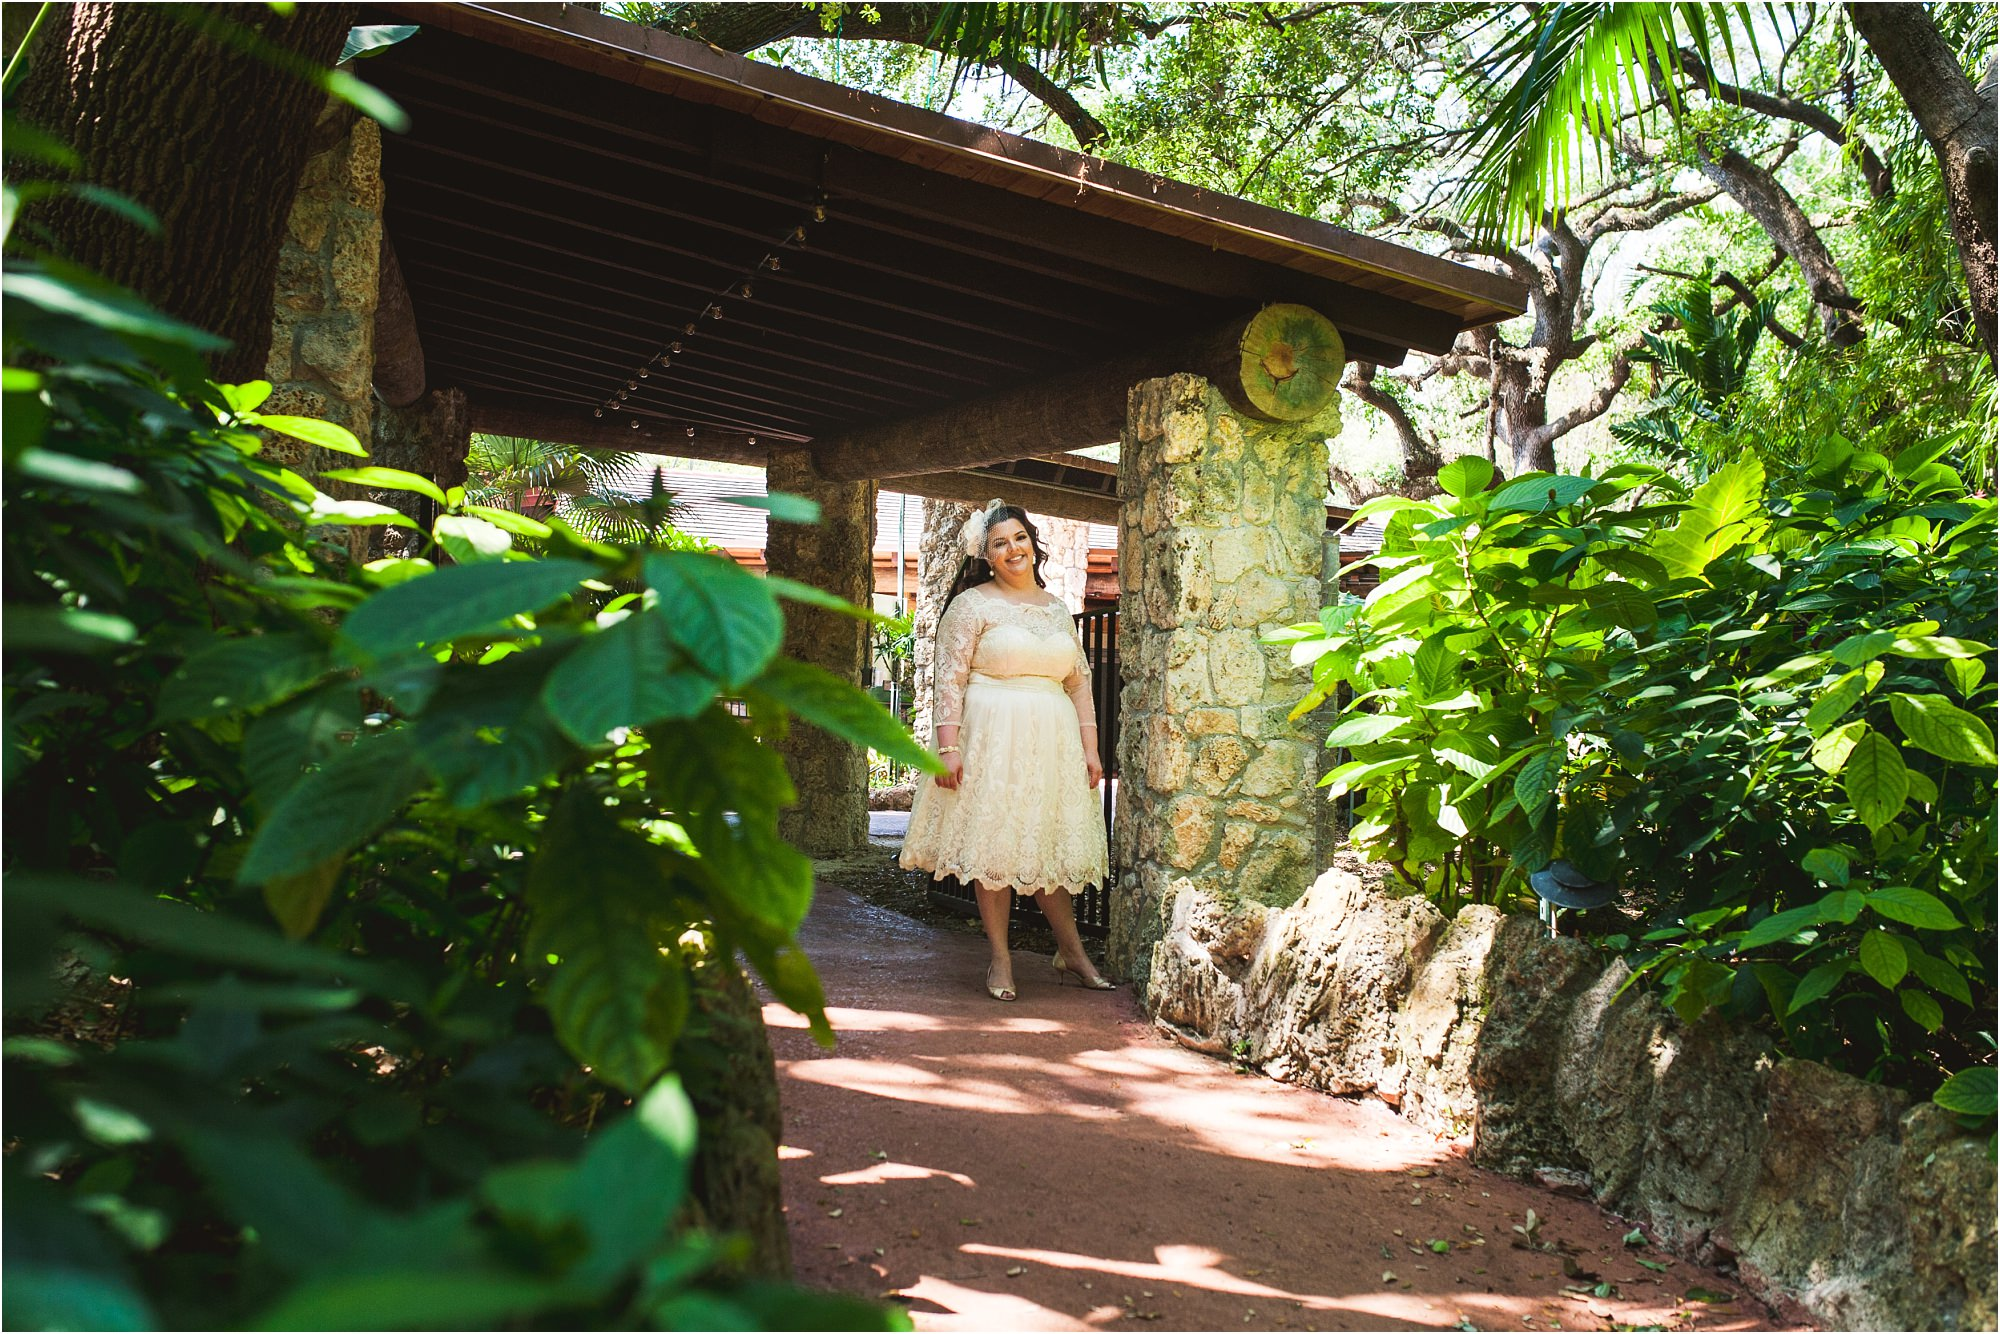 outdoor-rustic-pincrest-gardens-wedding-miami-photographer-jessenia-gonzalez_1005.jpg